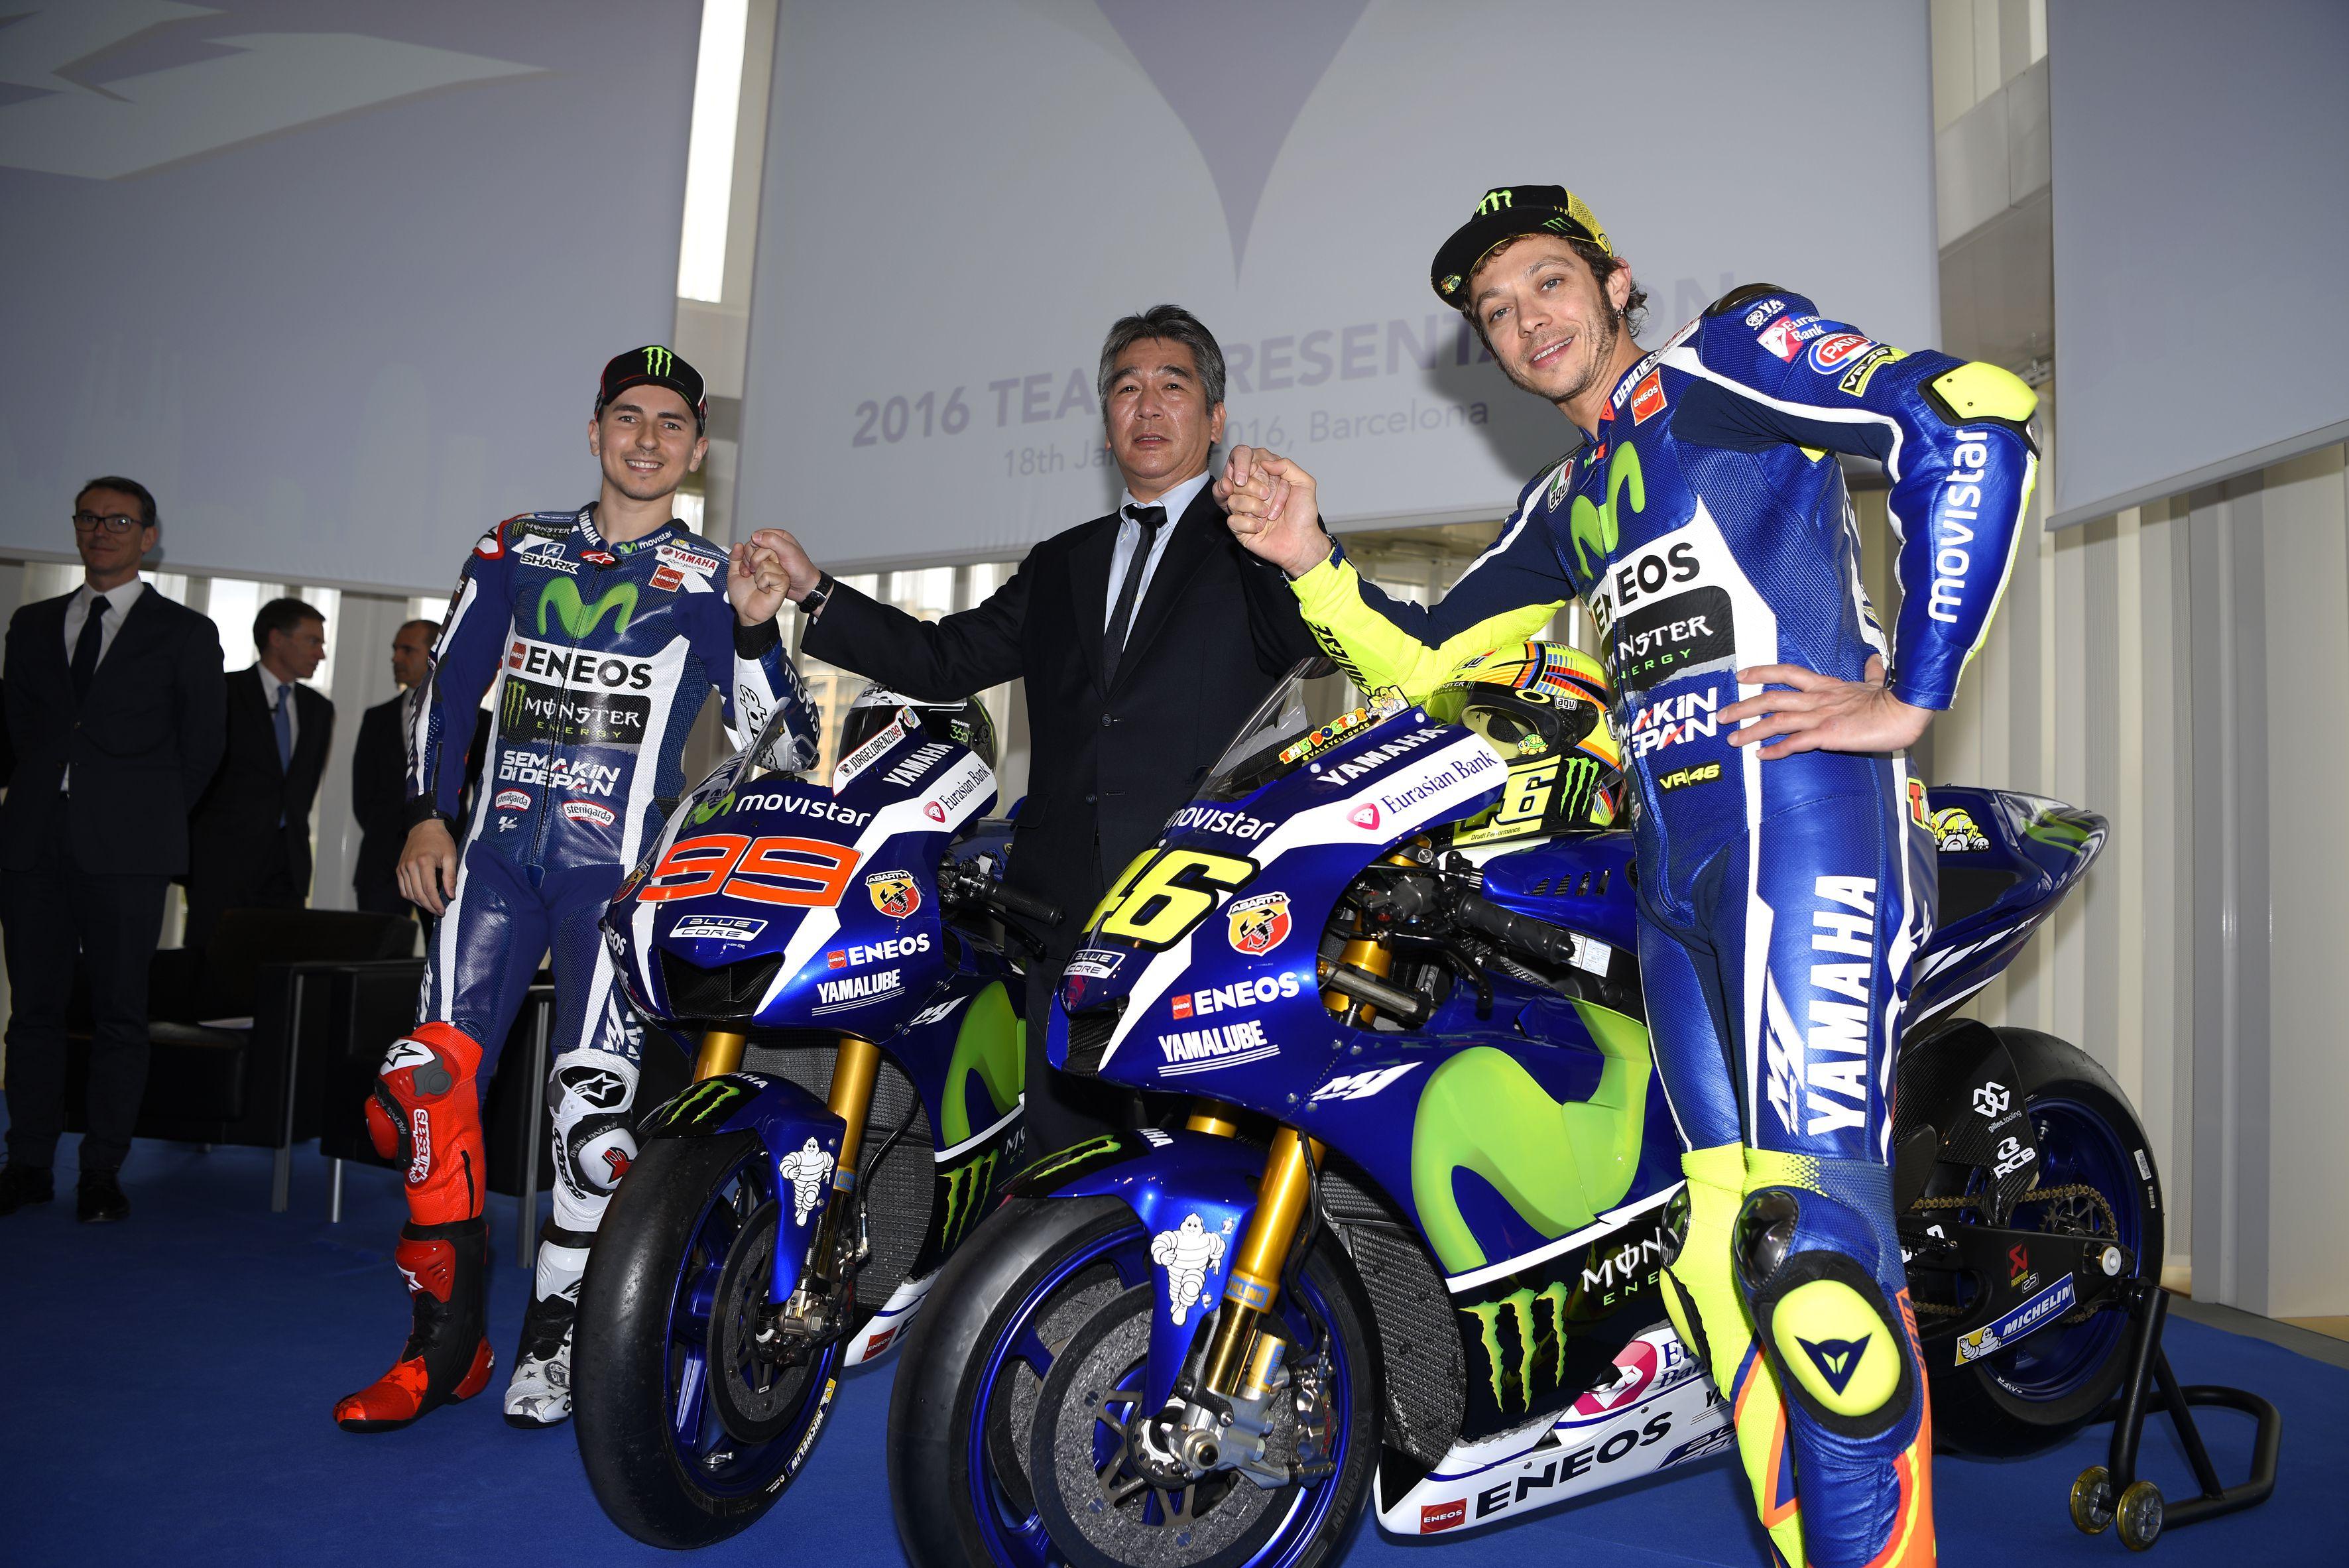 The Movistar Yamaha MotoGP Team Presents 2016 MotoGP Season Line Up in Barcelona - Yamaha Racing